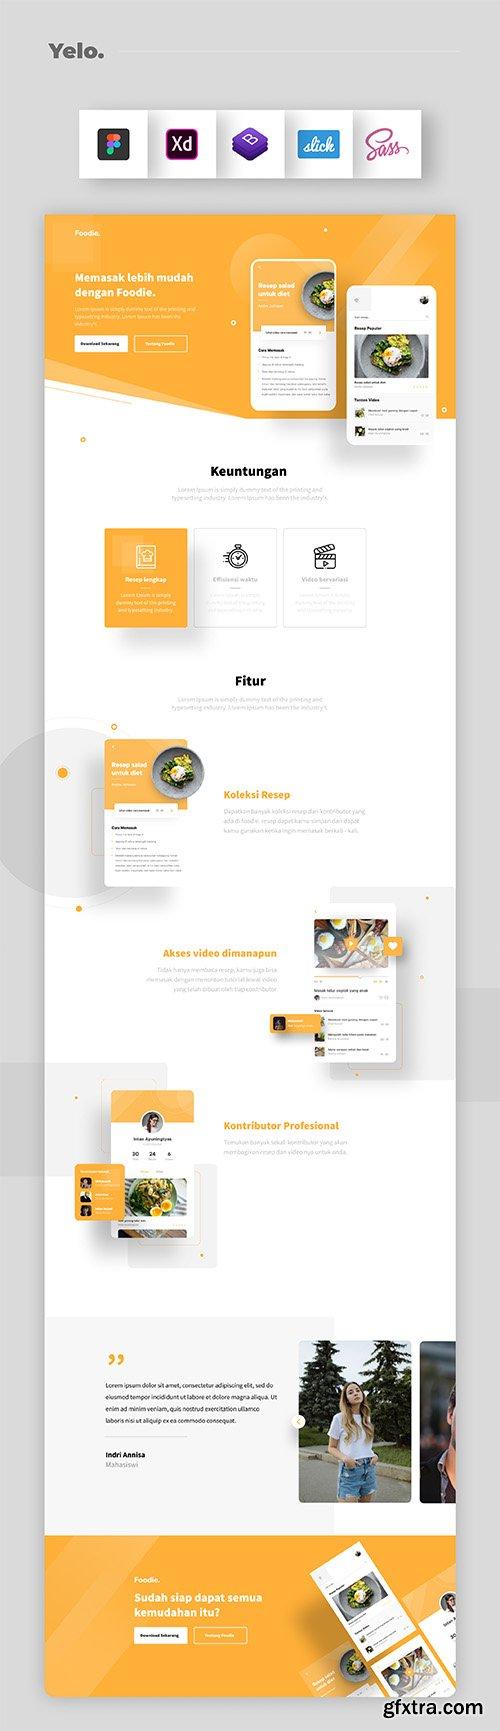 Yelo - Interactive Web Design